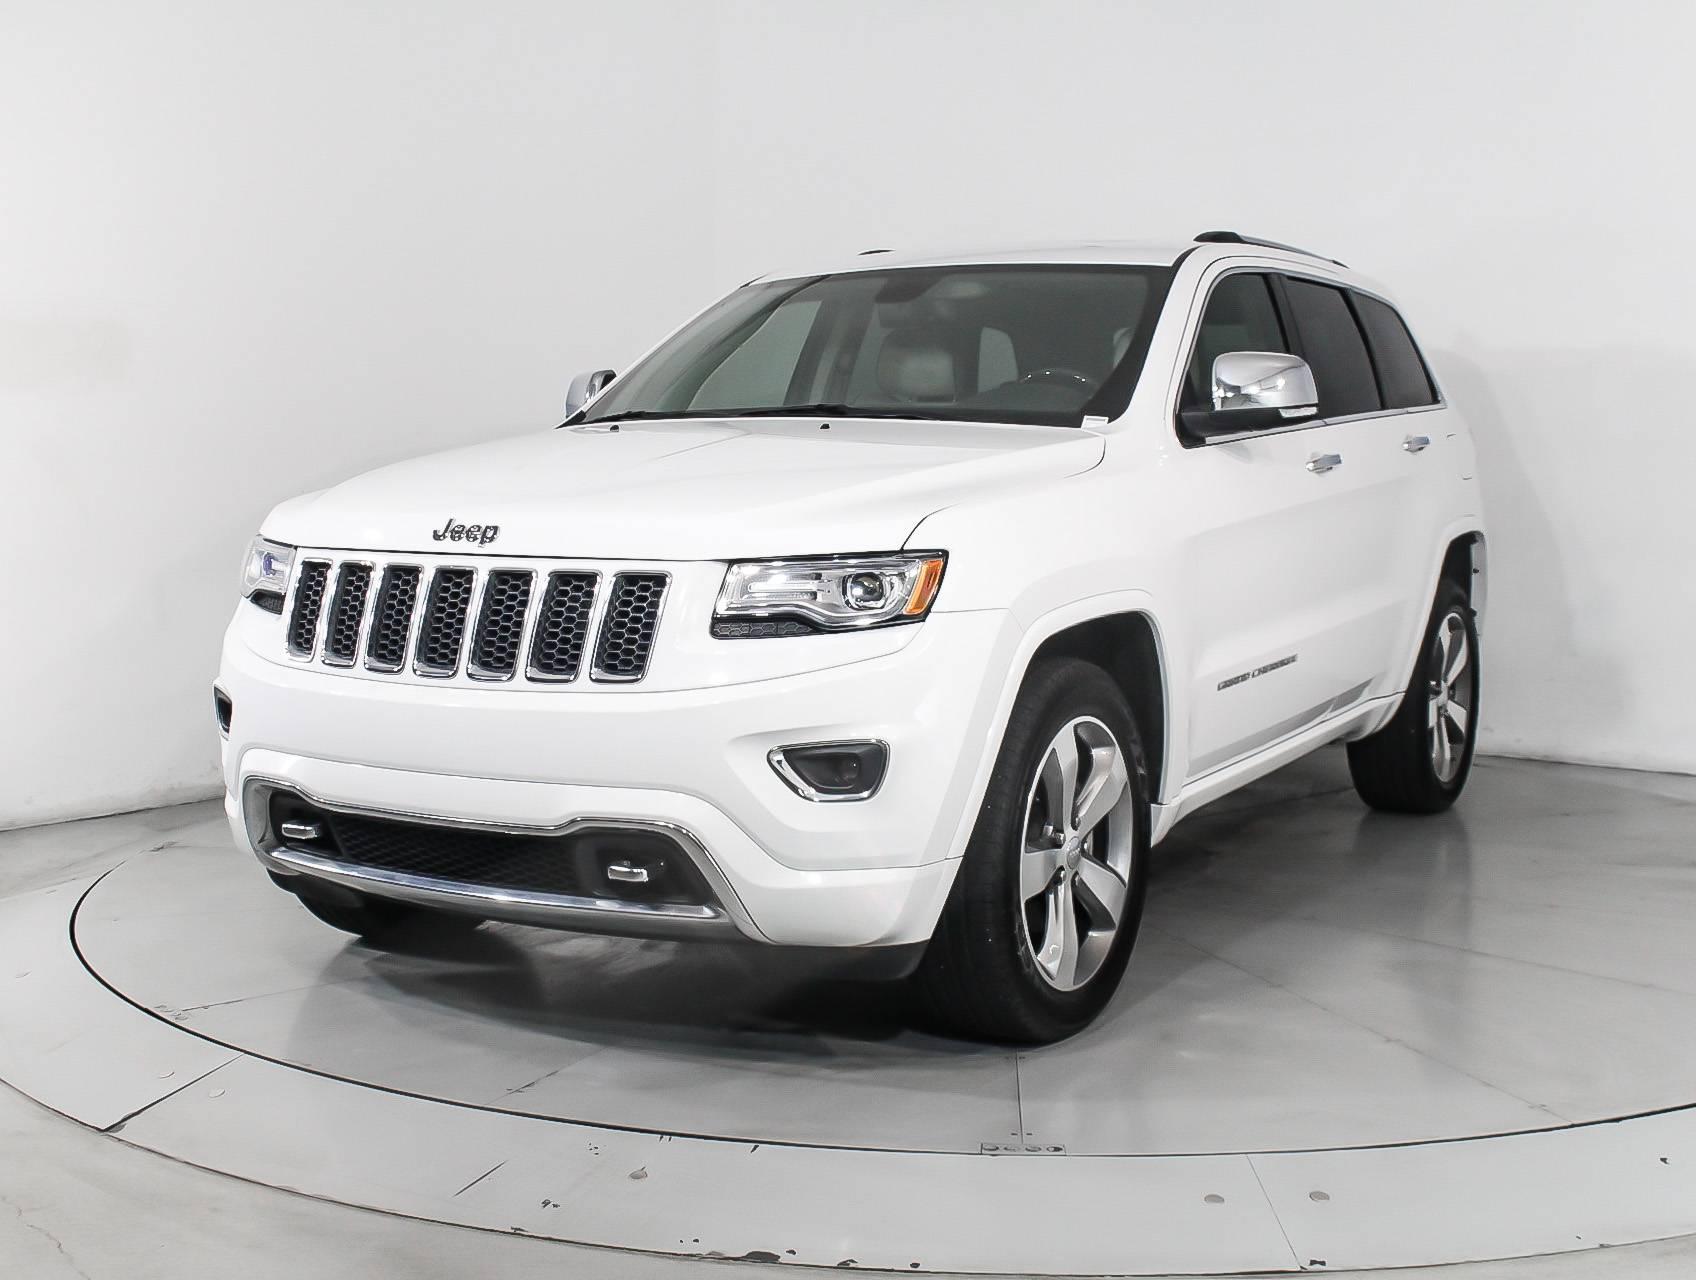 Used 2014 Jeep Grand Cherokee Overland Suv For Sale In Miami Fl